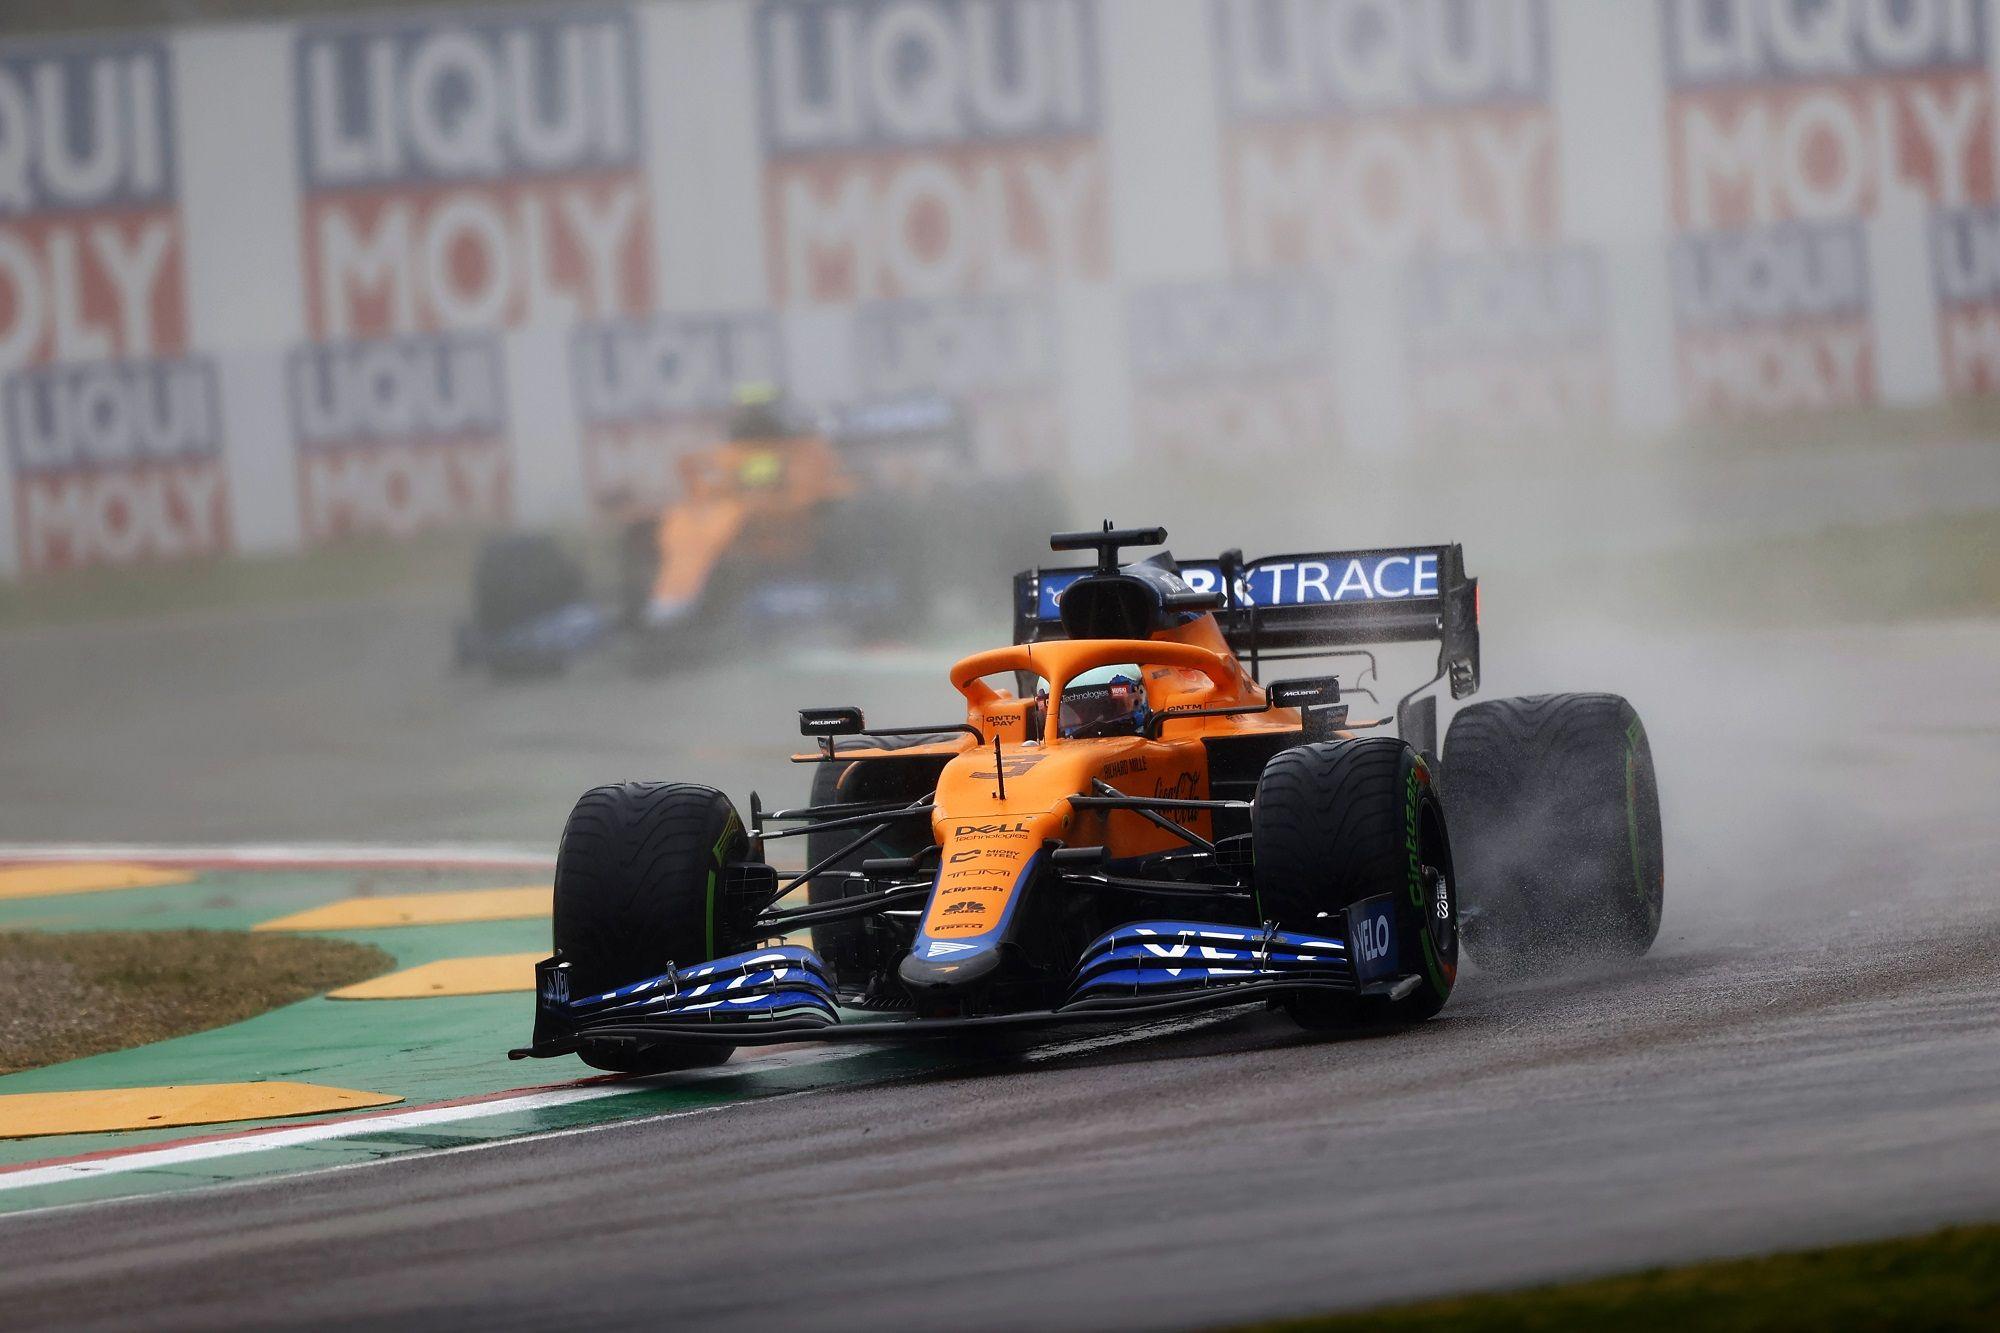 Daniel Ricciardo, Andreas Seidl